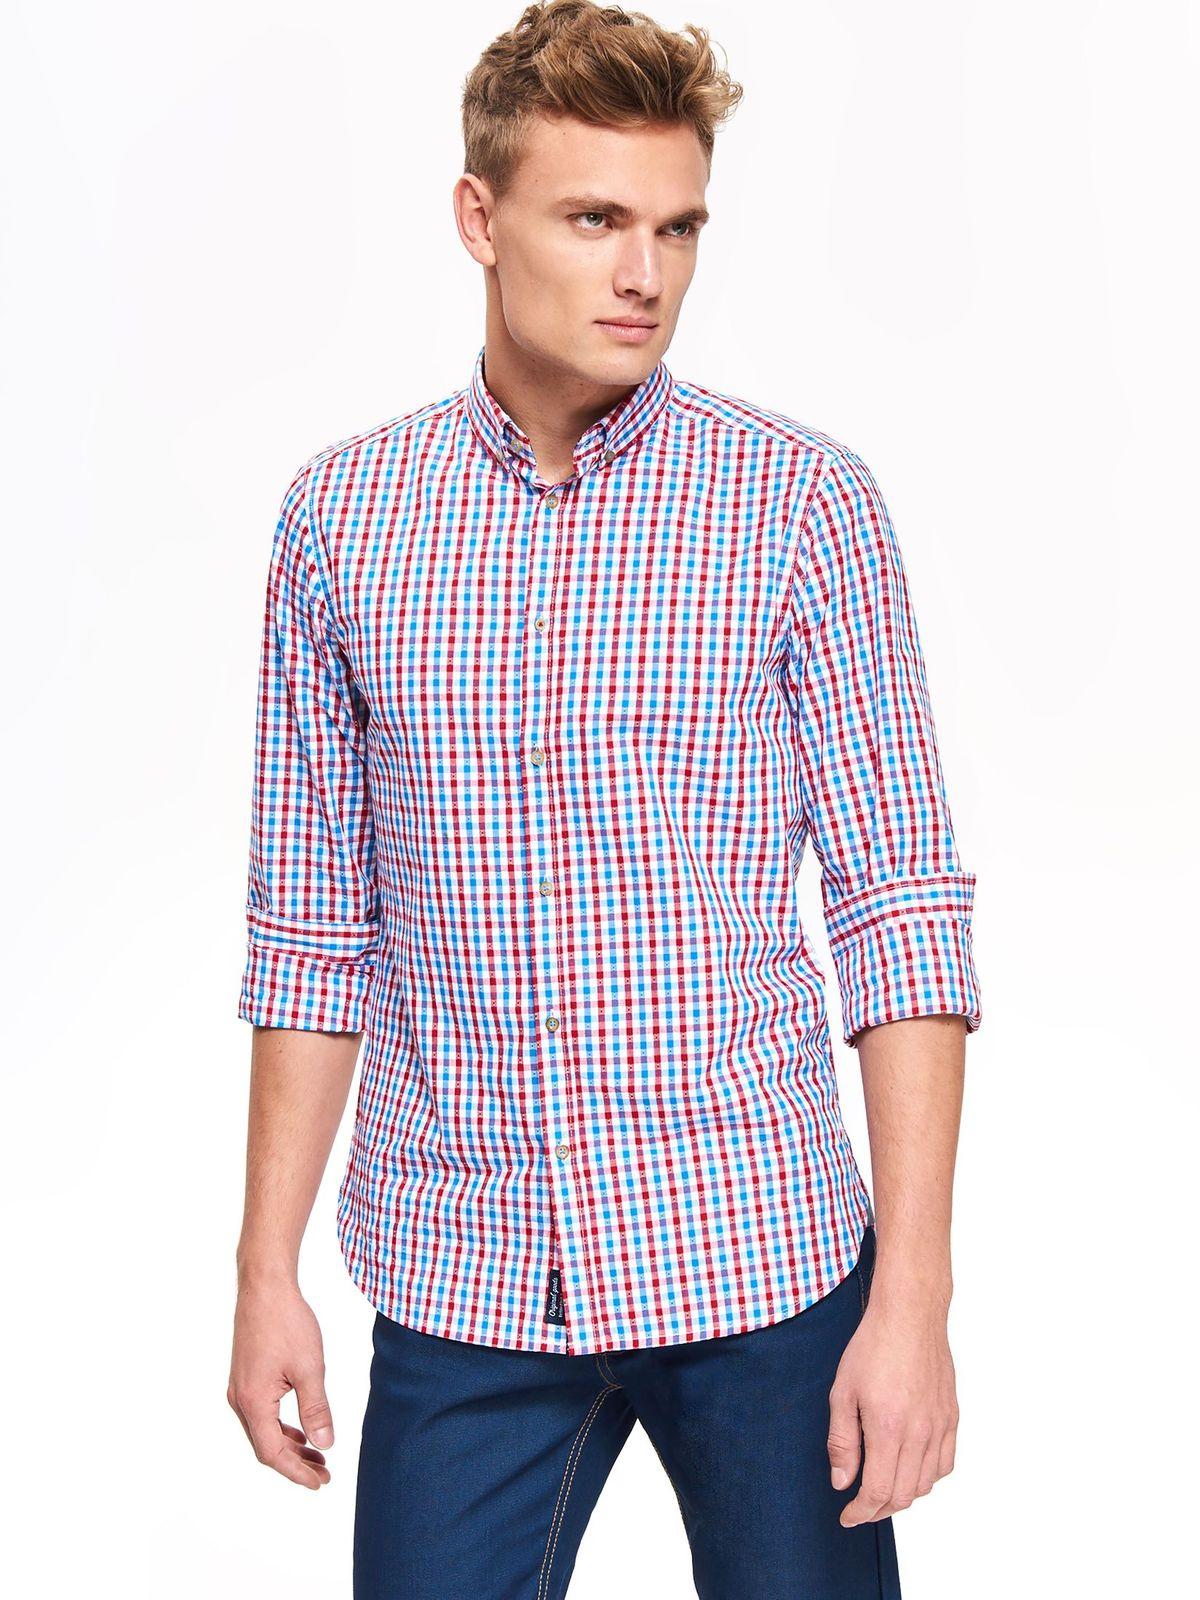 38b9f14b792e TOP SECRET TOP SECRET ανδρικο καρο πουκαμισο